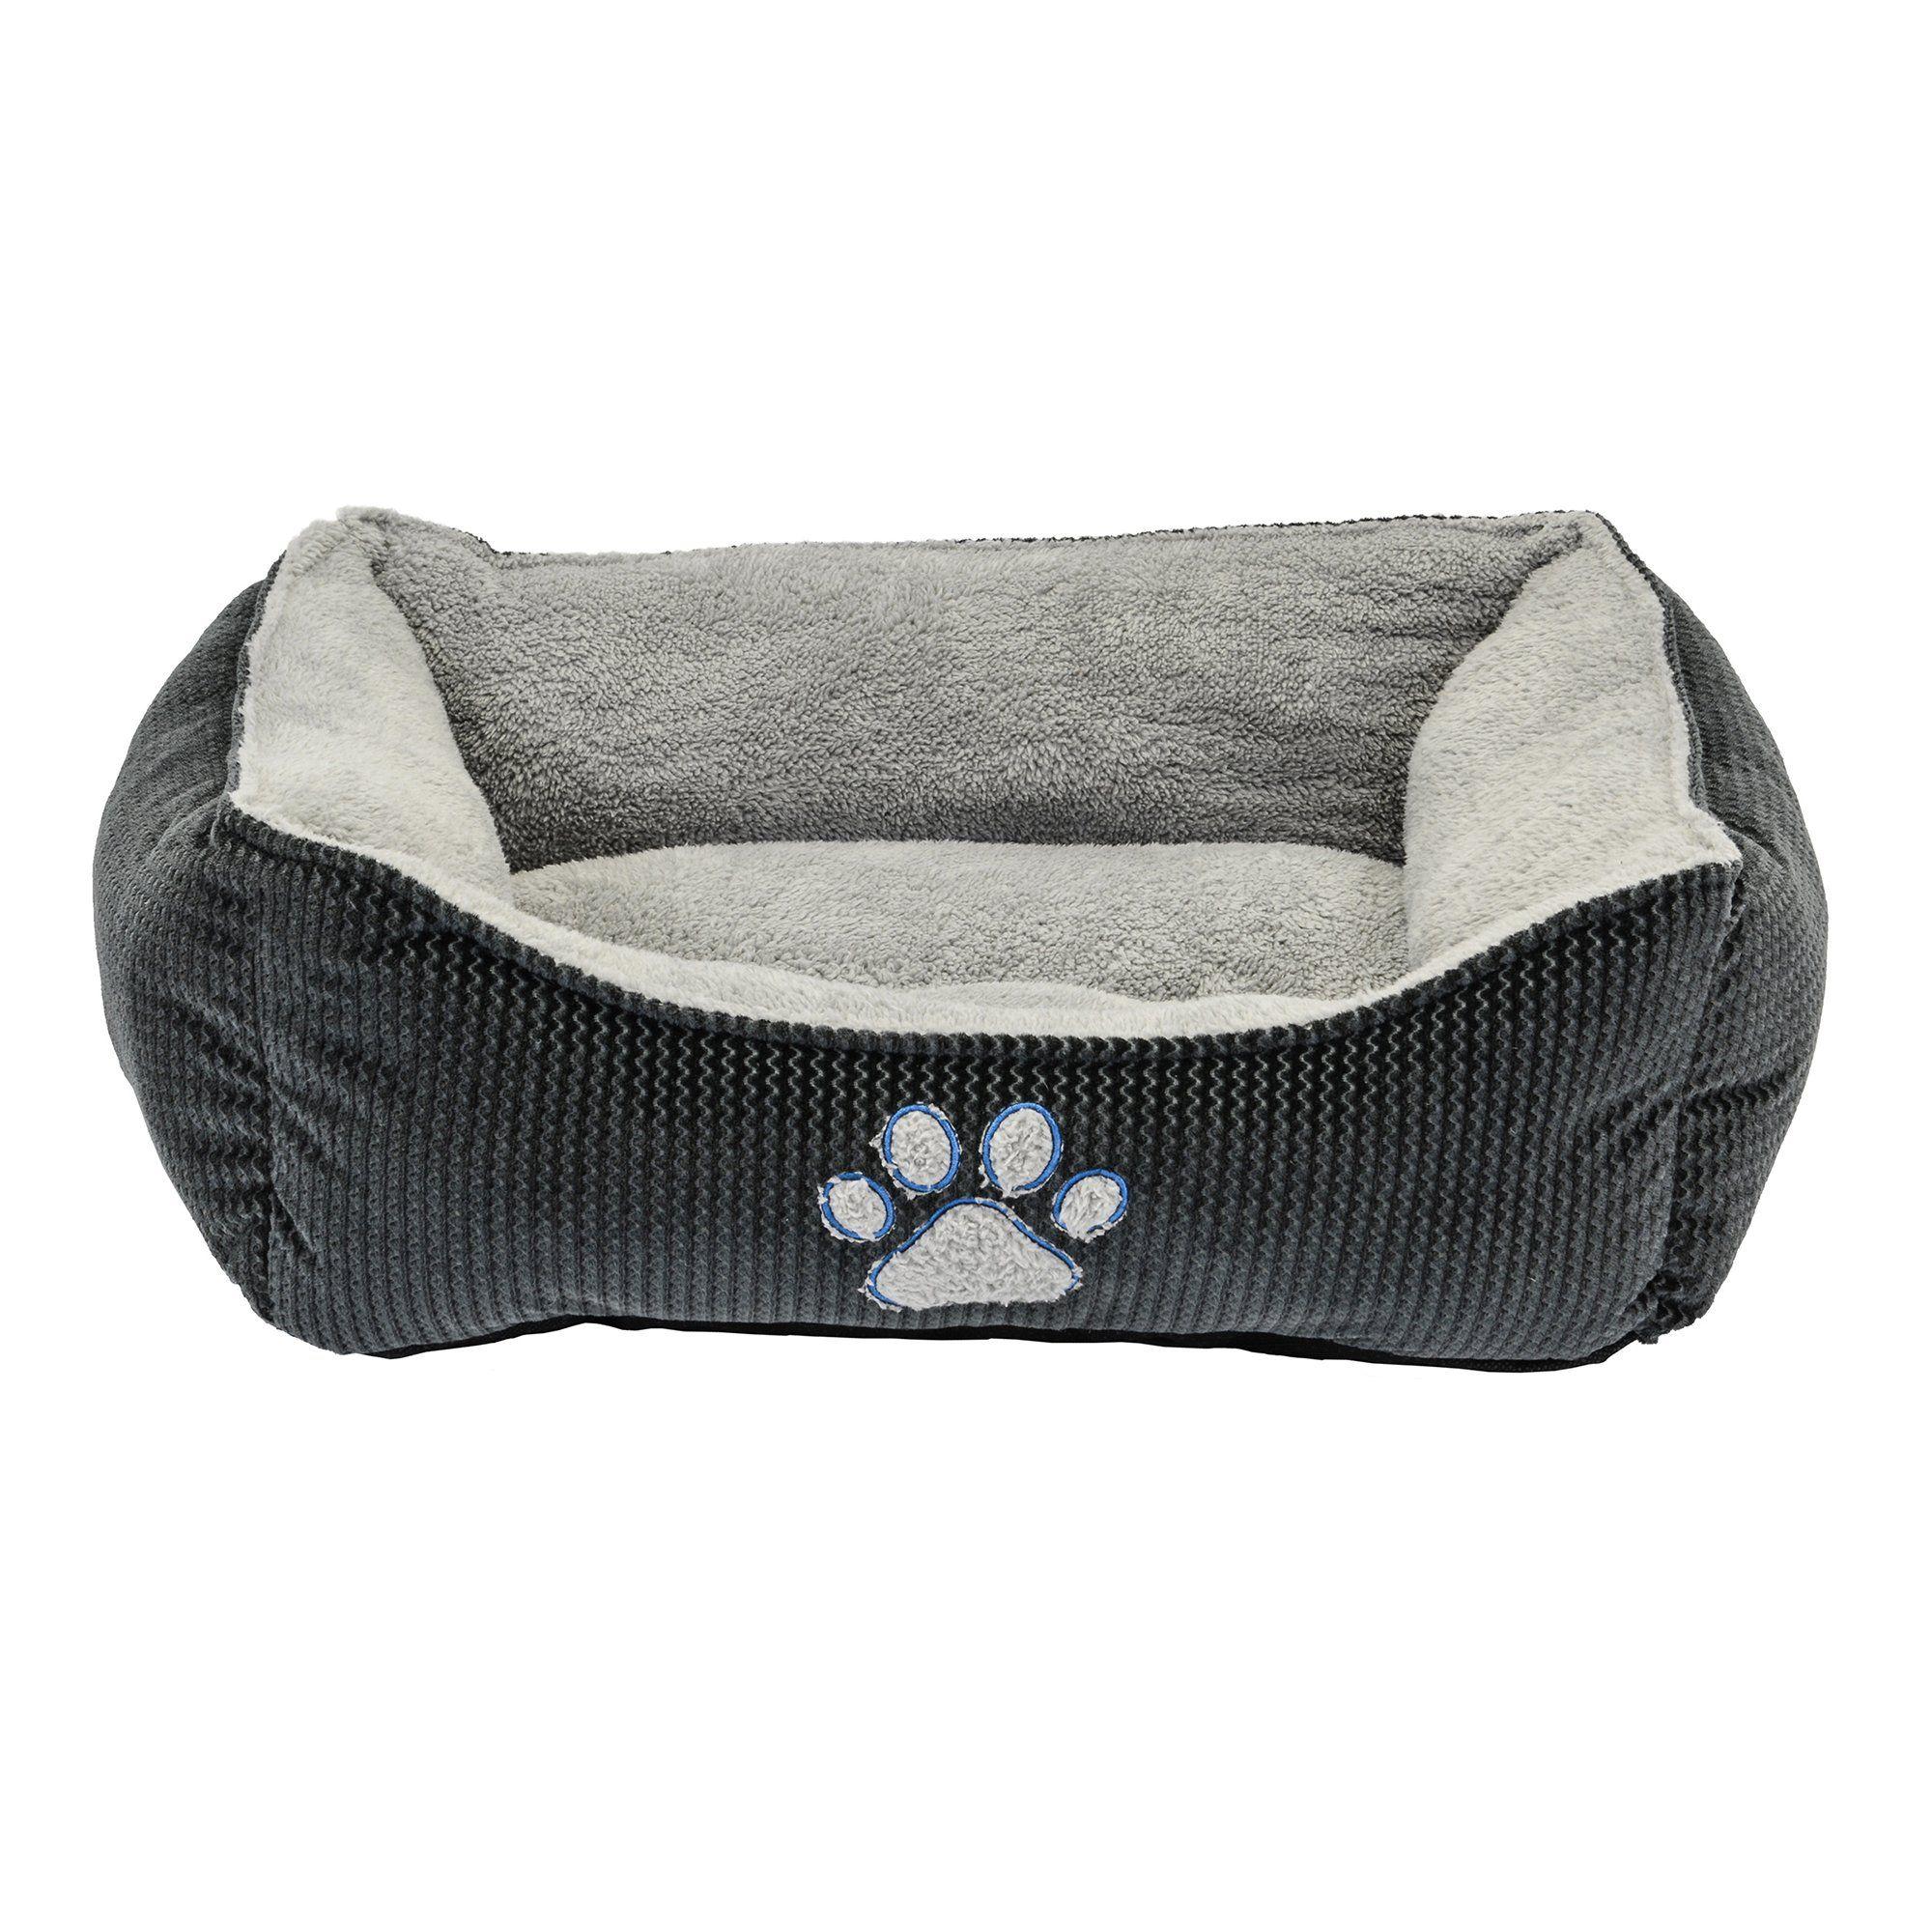 Dallas Manufacturing Zigzag Gray Box Dog Bed 25 L X 21 W Dog